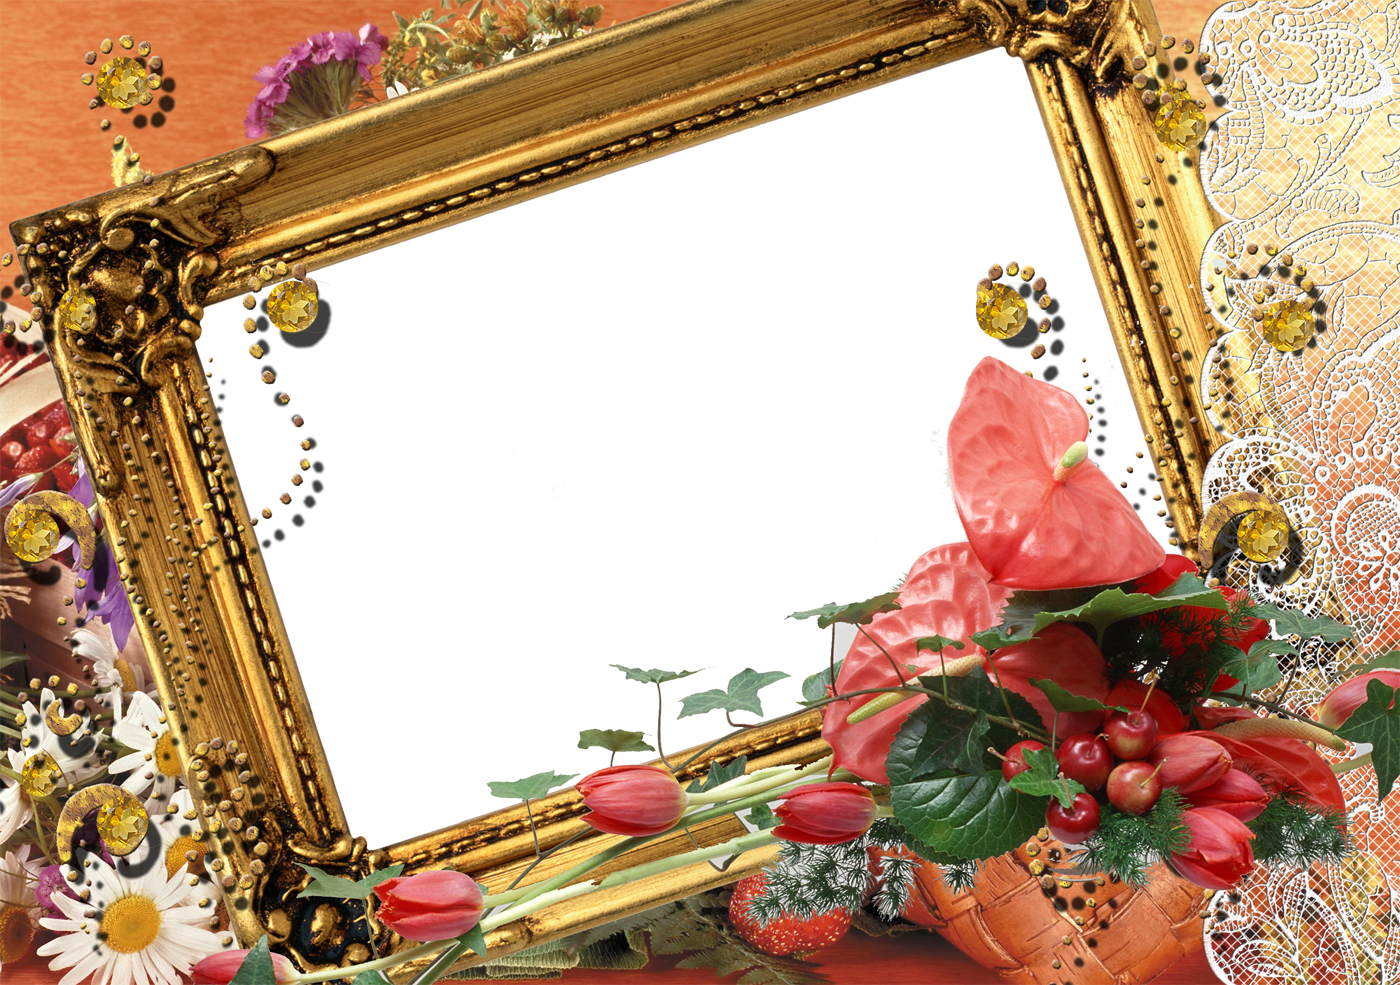 Photoshop clipart wedding photo frame /frames backgrounds background+++new+marriage+ wedding